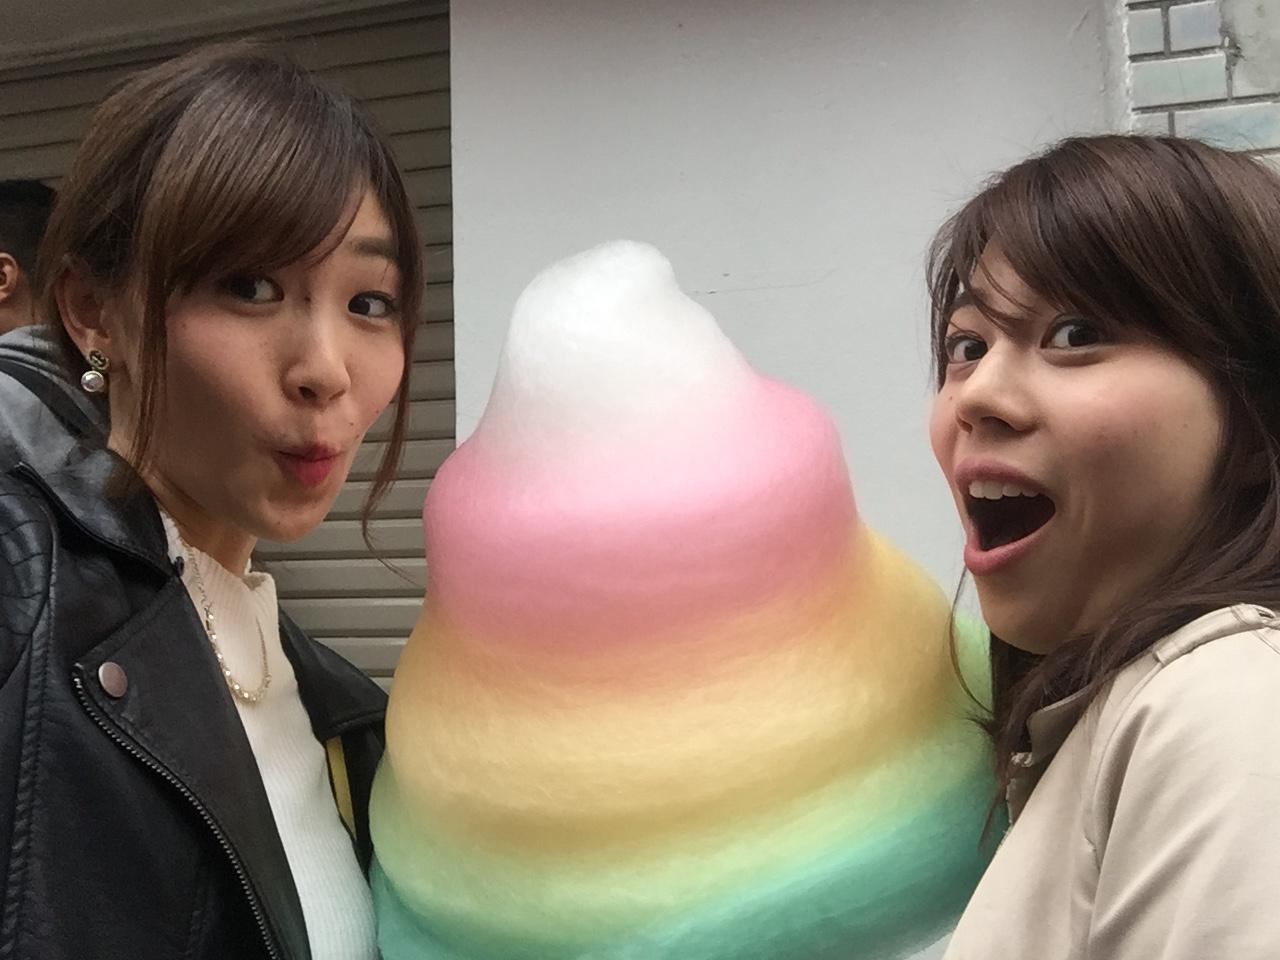 【FOOD】外国人にも大人気!「 sweet xo 」原宿竹下の巨大カラフルわたあめ♡_4